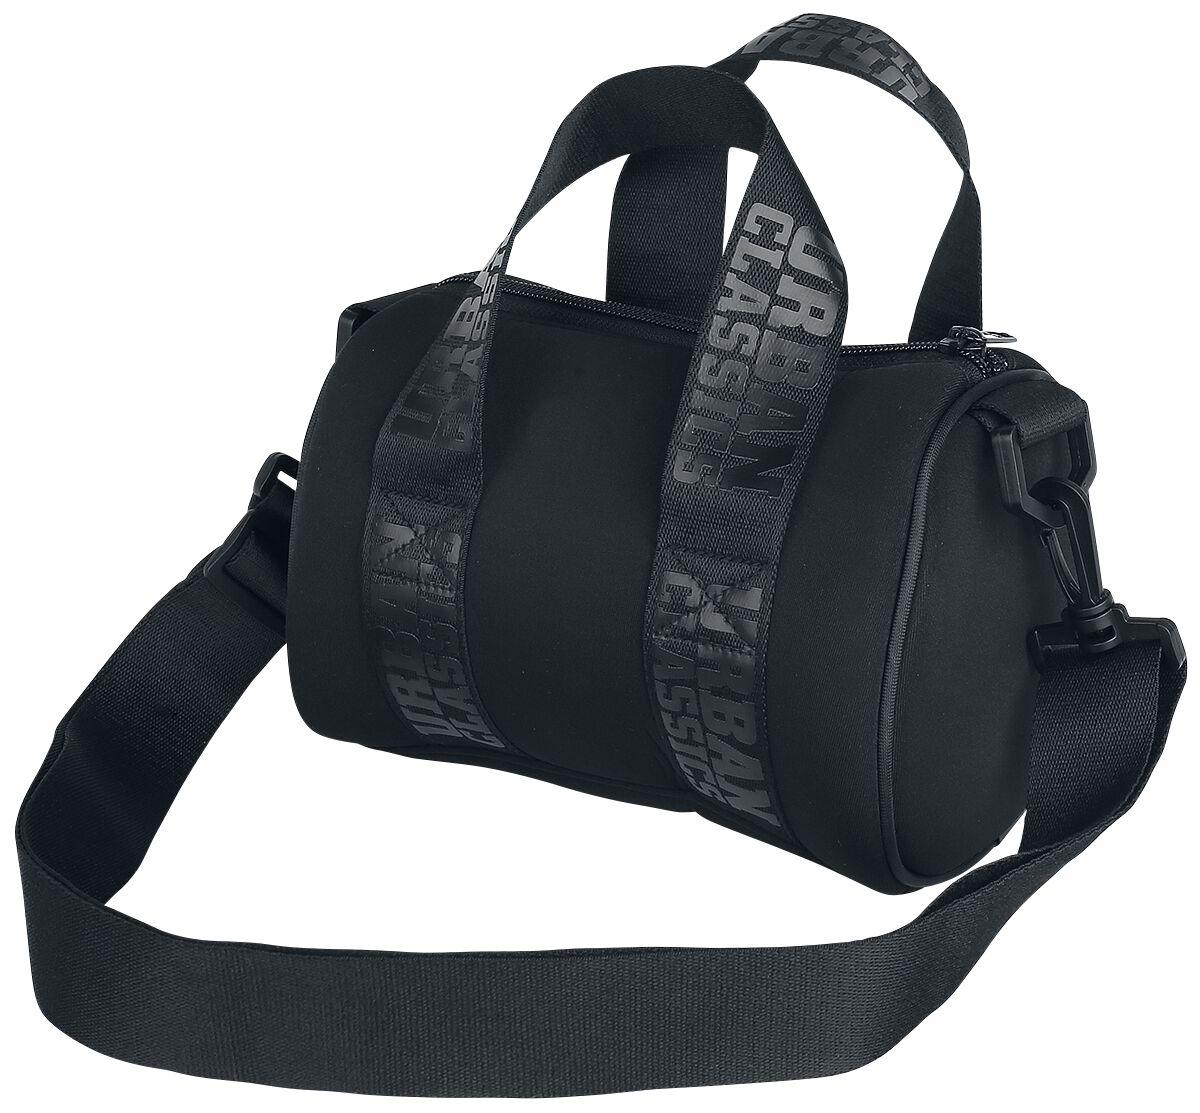 Image of   Urban Classics Handbag Mini Neoprene Håndtaske sort